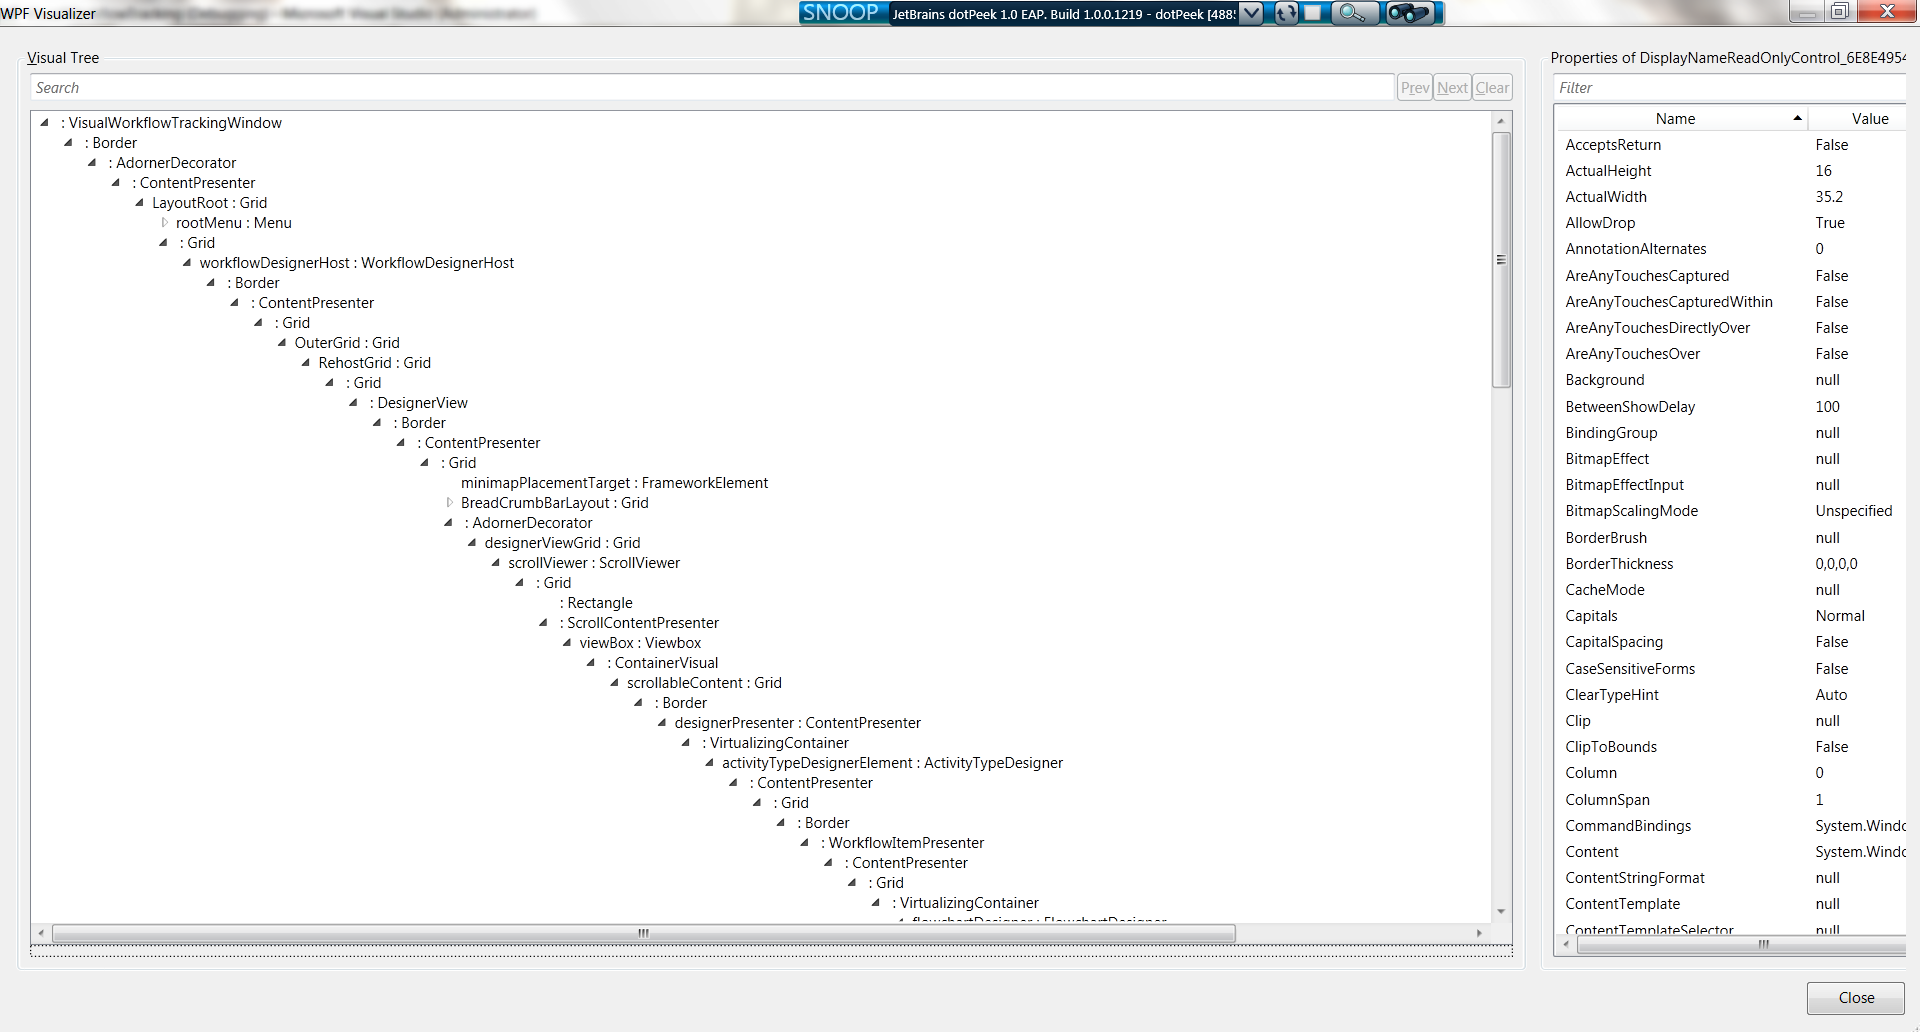 Workflow 4 0 1 StateMachine - Distributed Tracking Visualization